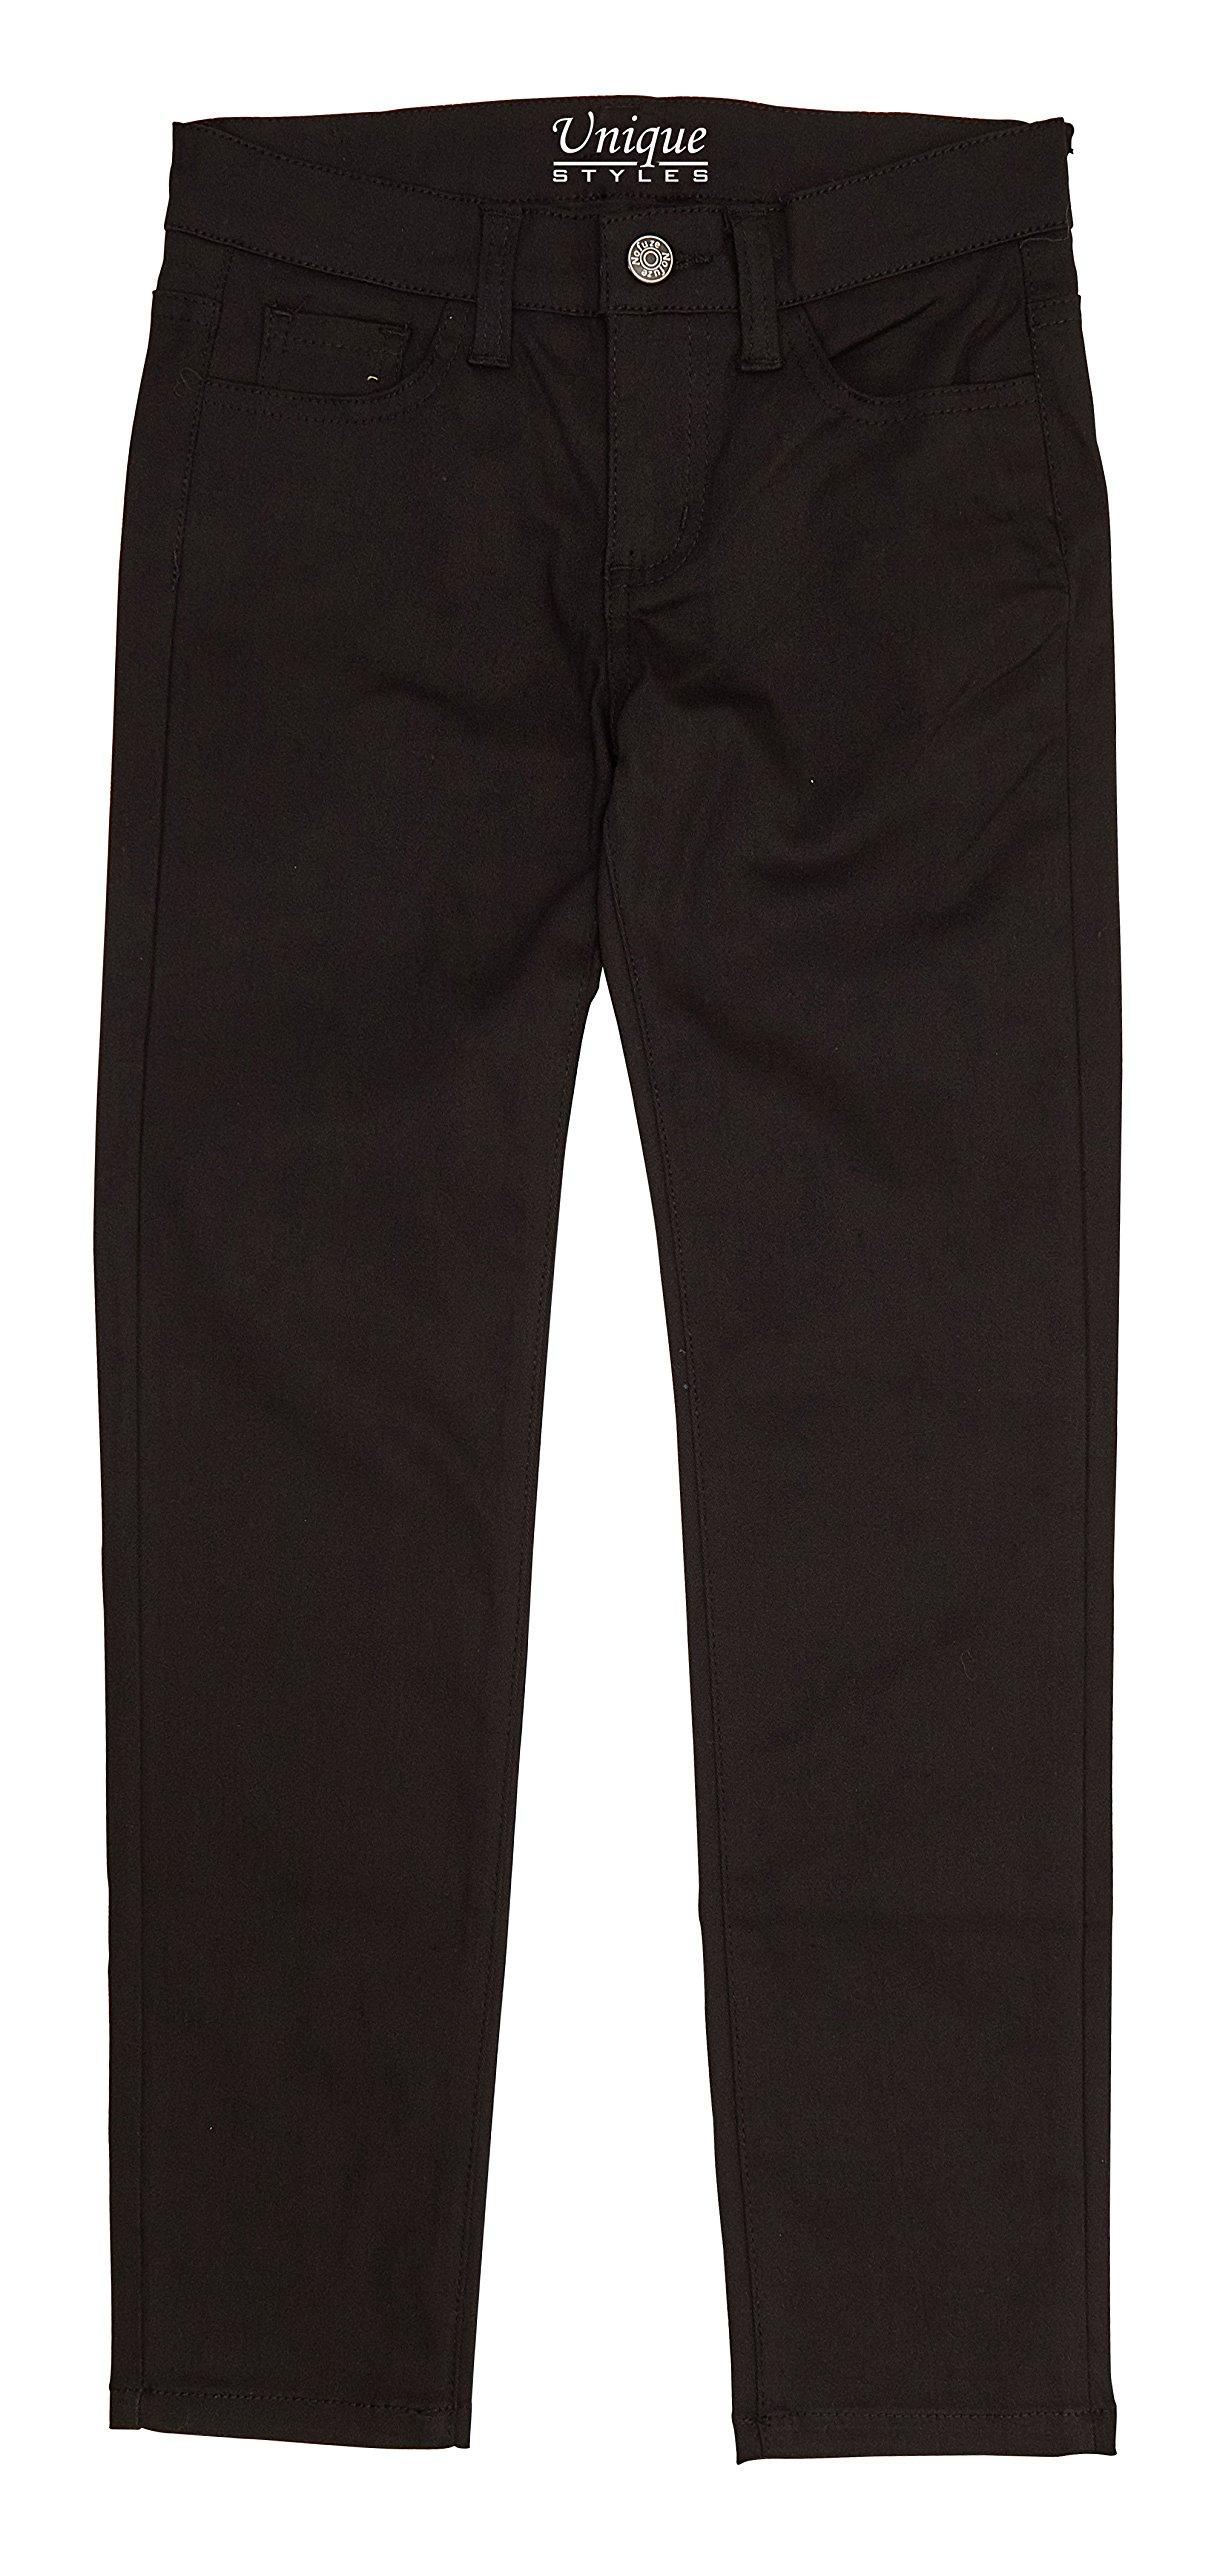 Girls Cotton Pants Straight Leg Flared Bottom Solid Casual School Uniform Trouser (Black - 1, 10)